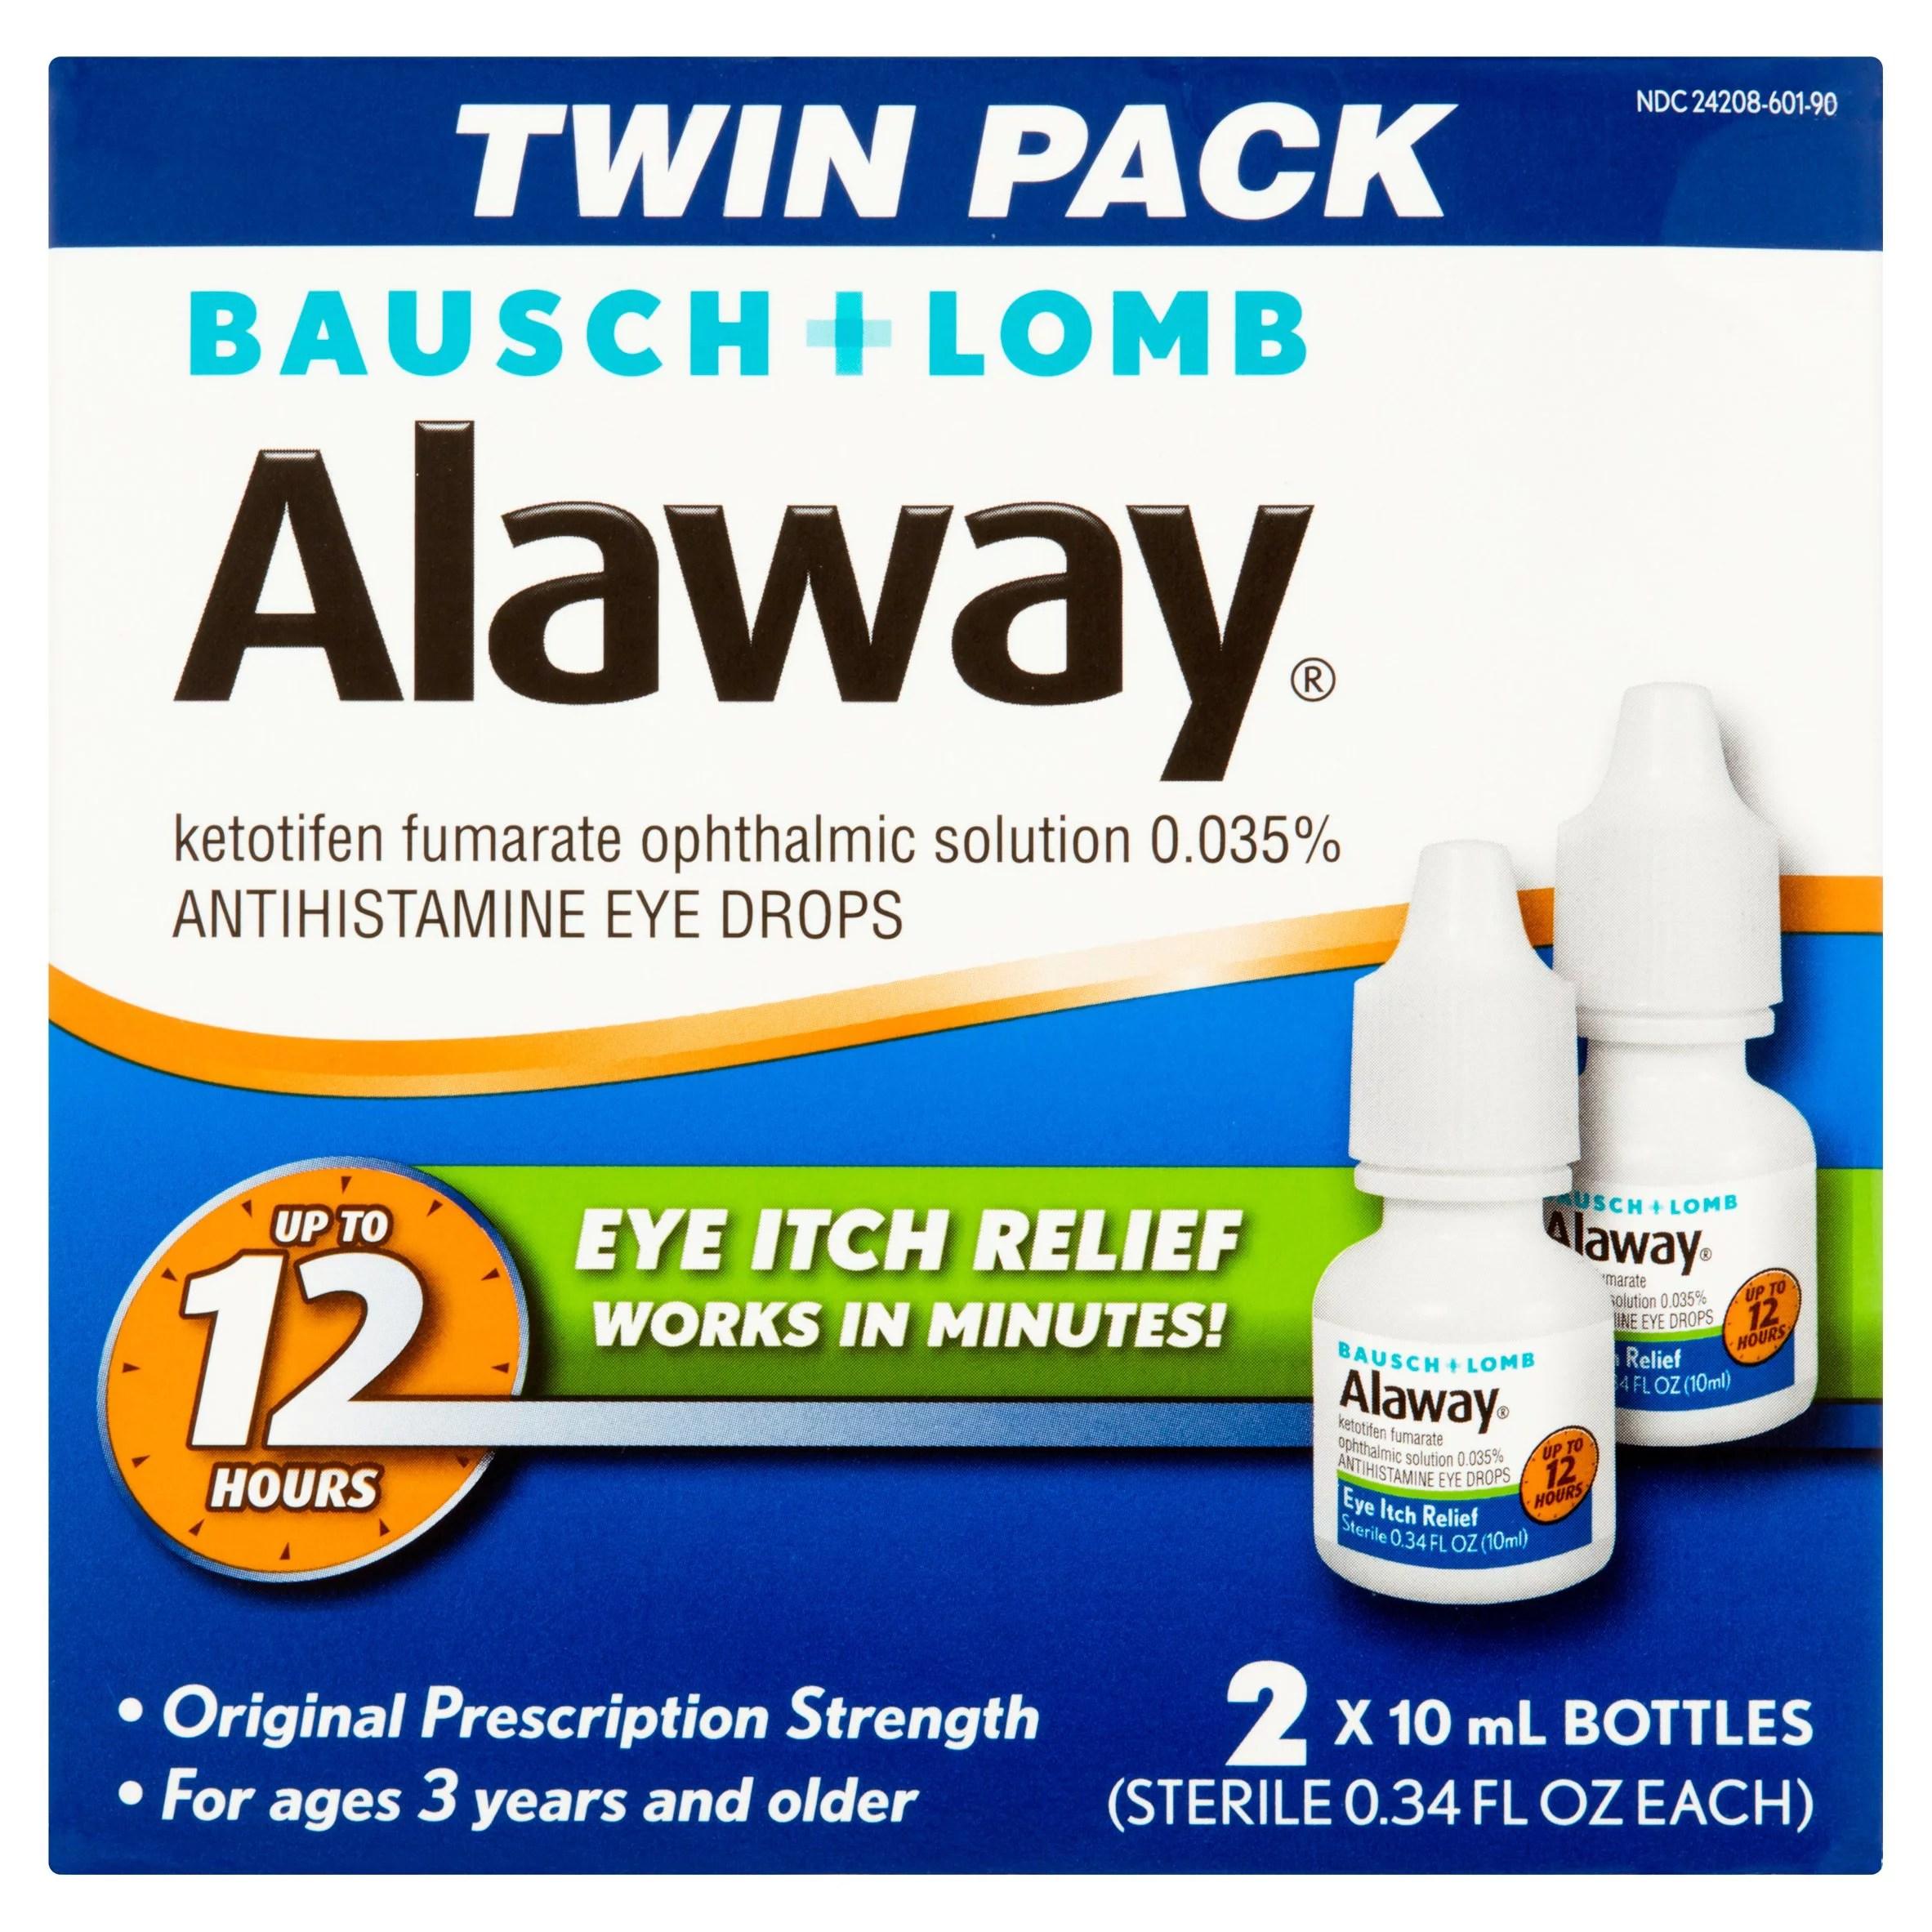 Bausch + Lomb Alaway Antihistamine Eye Drops Twin Pack 0 ...